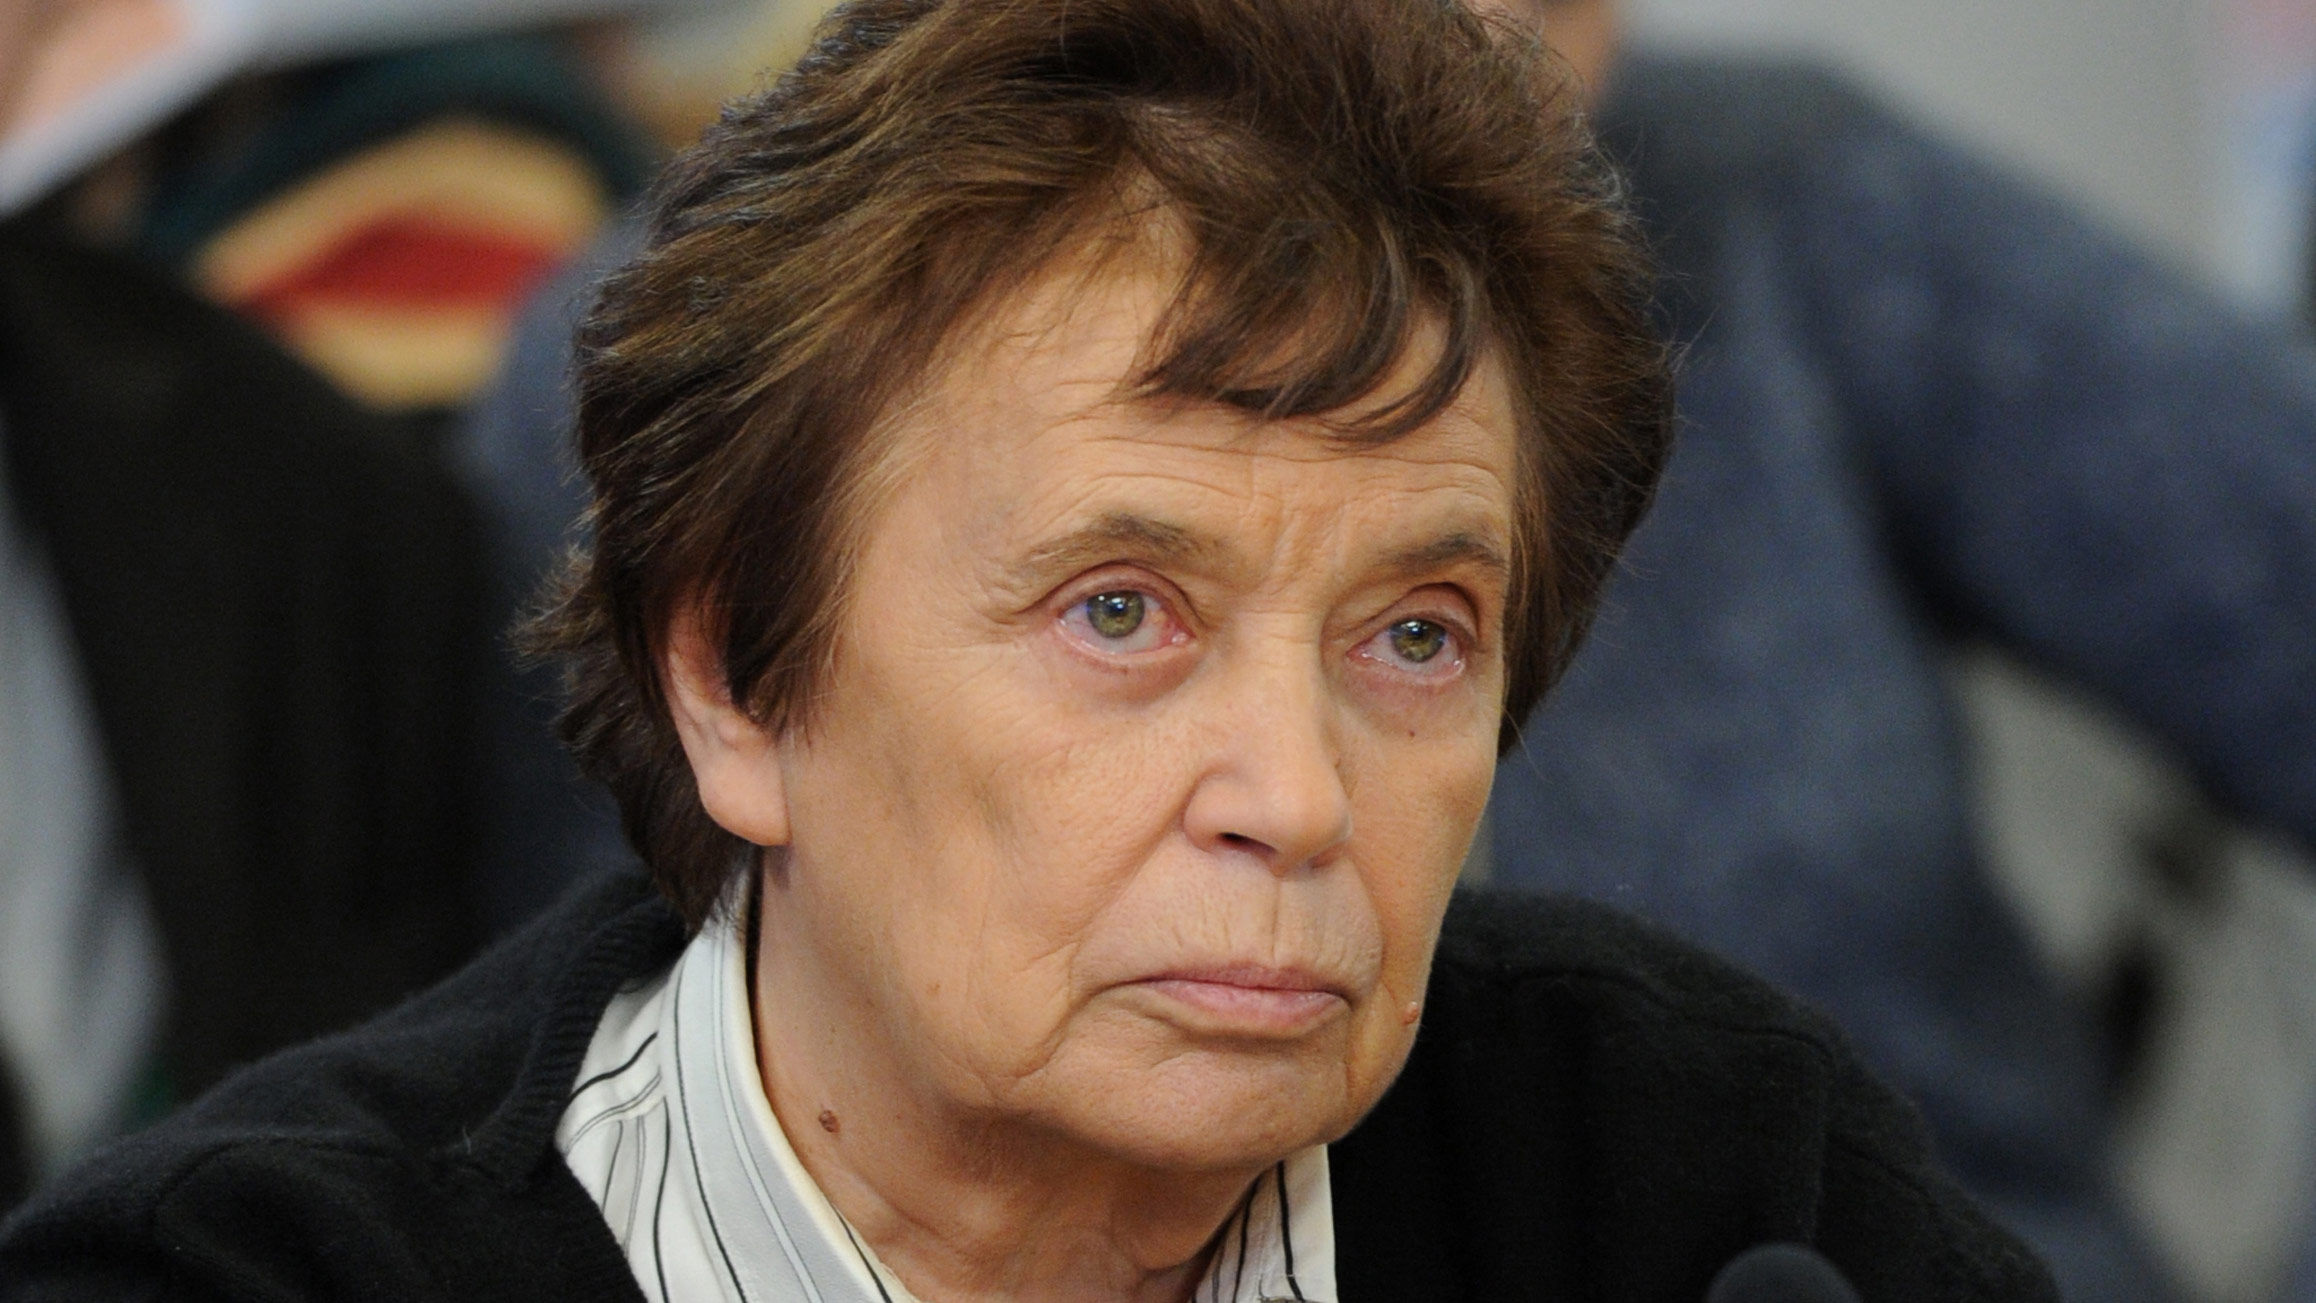 <p>Анна Дмитриева. Фото: &copy; РИА Новости/Алексей Филиппов</p>